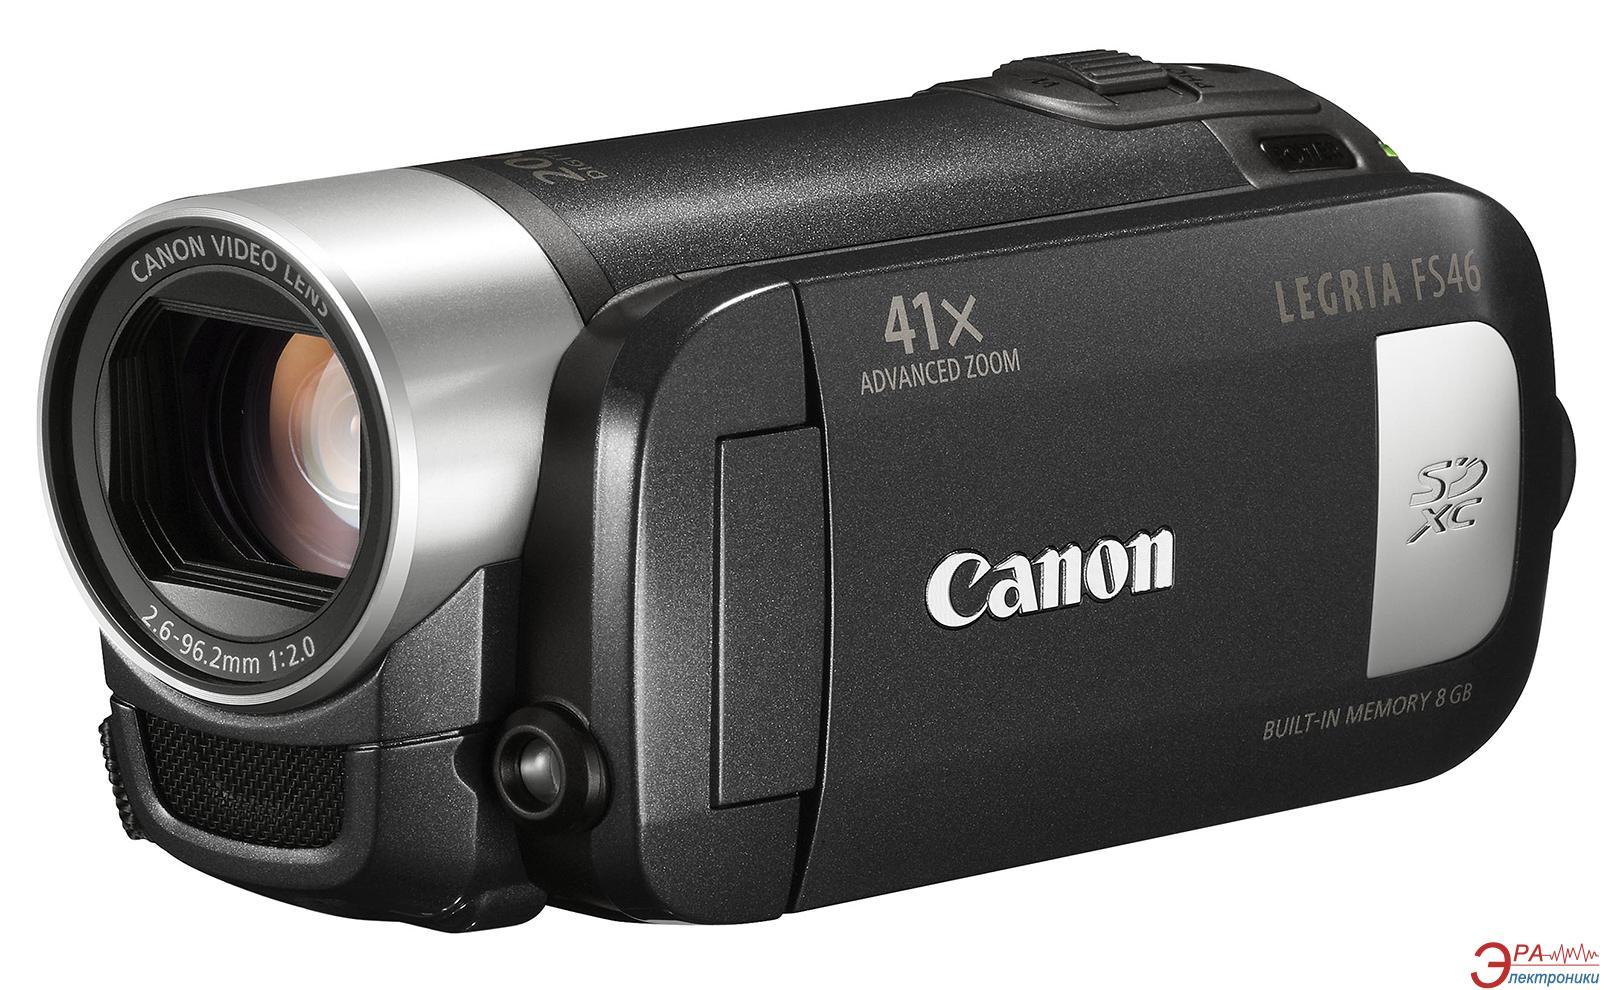 Цифровая видеокамера Canon Legria FS46 (5025B011)